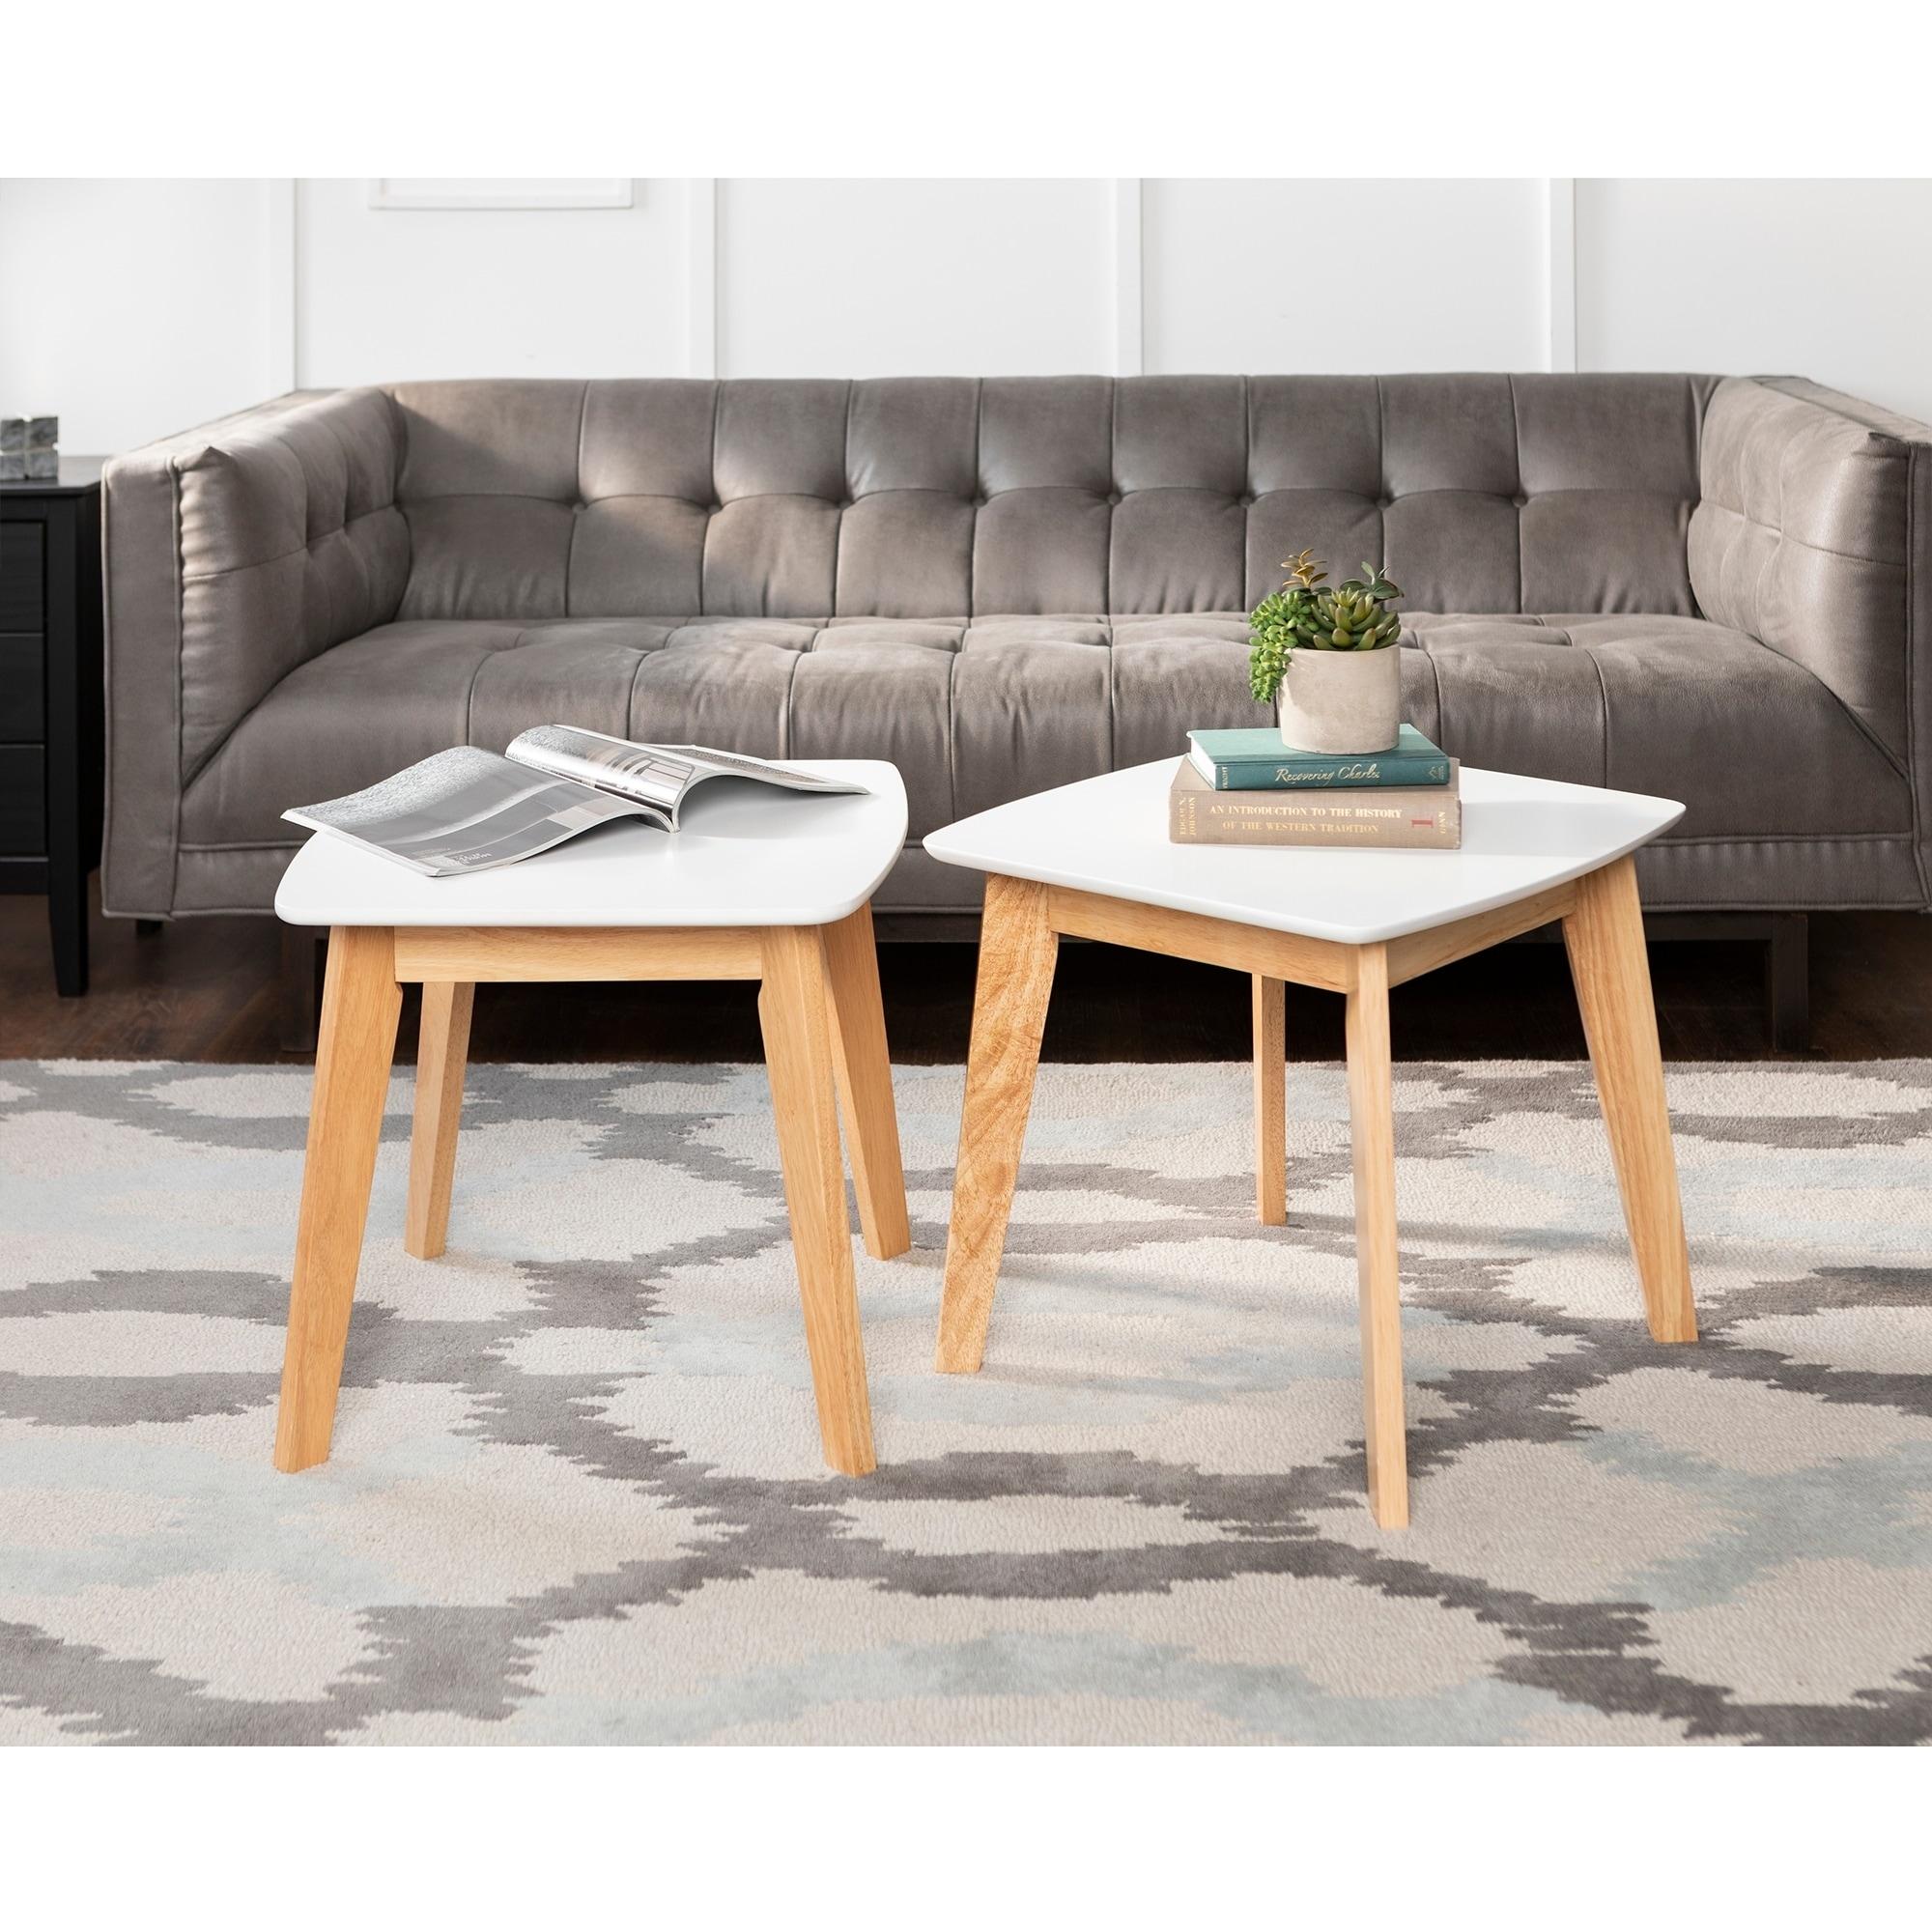 20-inch Retro Modern End Tables (Set of 2) (Retro Modern ...